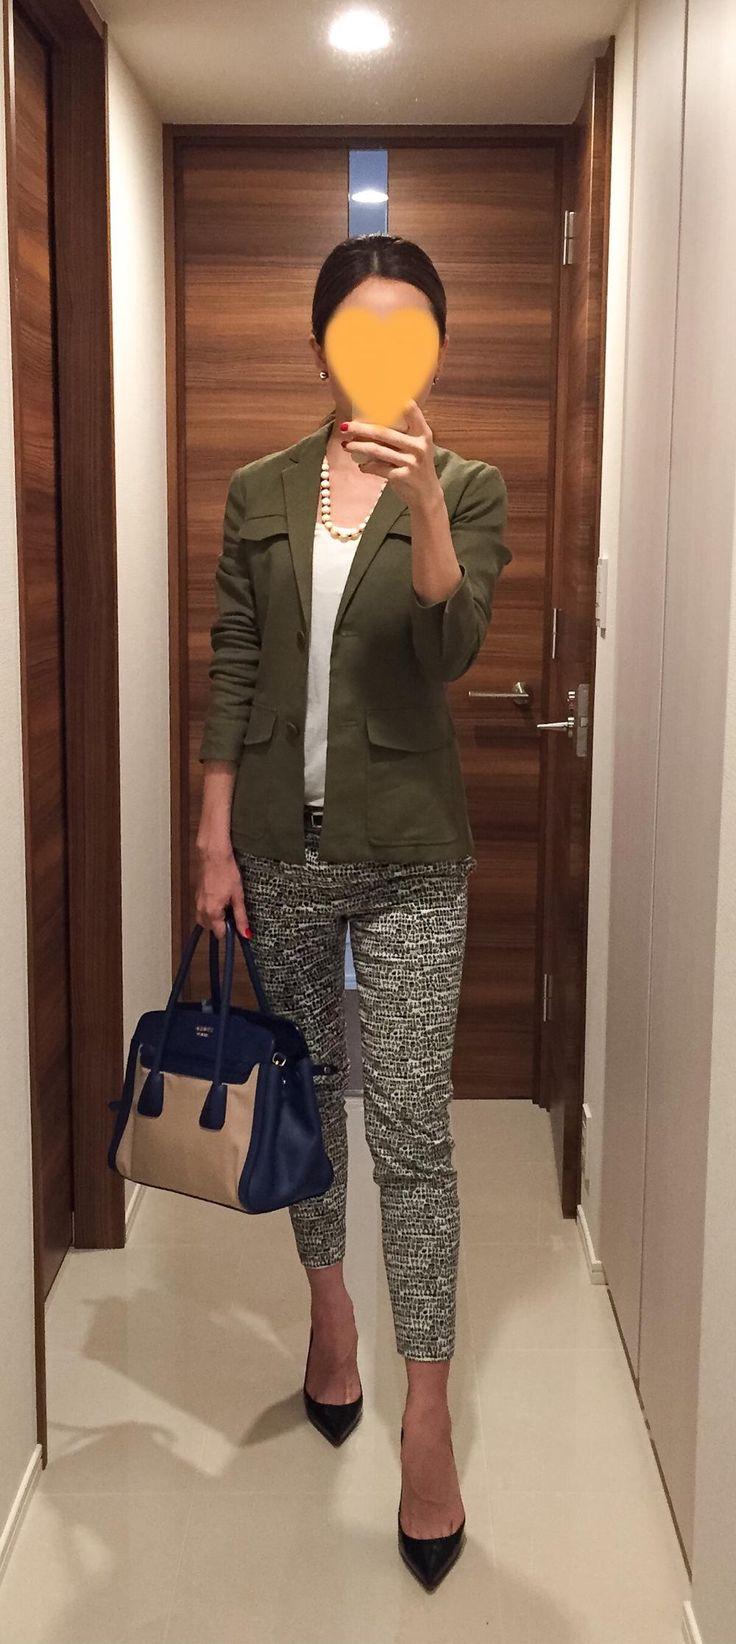 Khaki jacket: Theory, White tee: SISLEY, Pants: Tomorrowland, Bag: PRADA, Pumps: Christian Louboutin